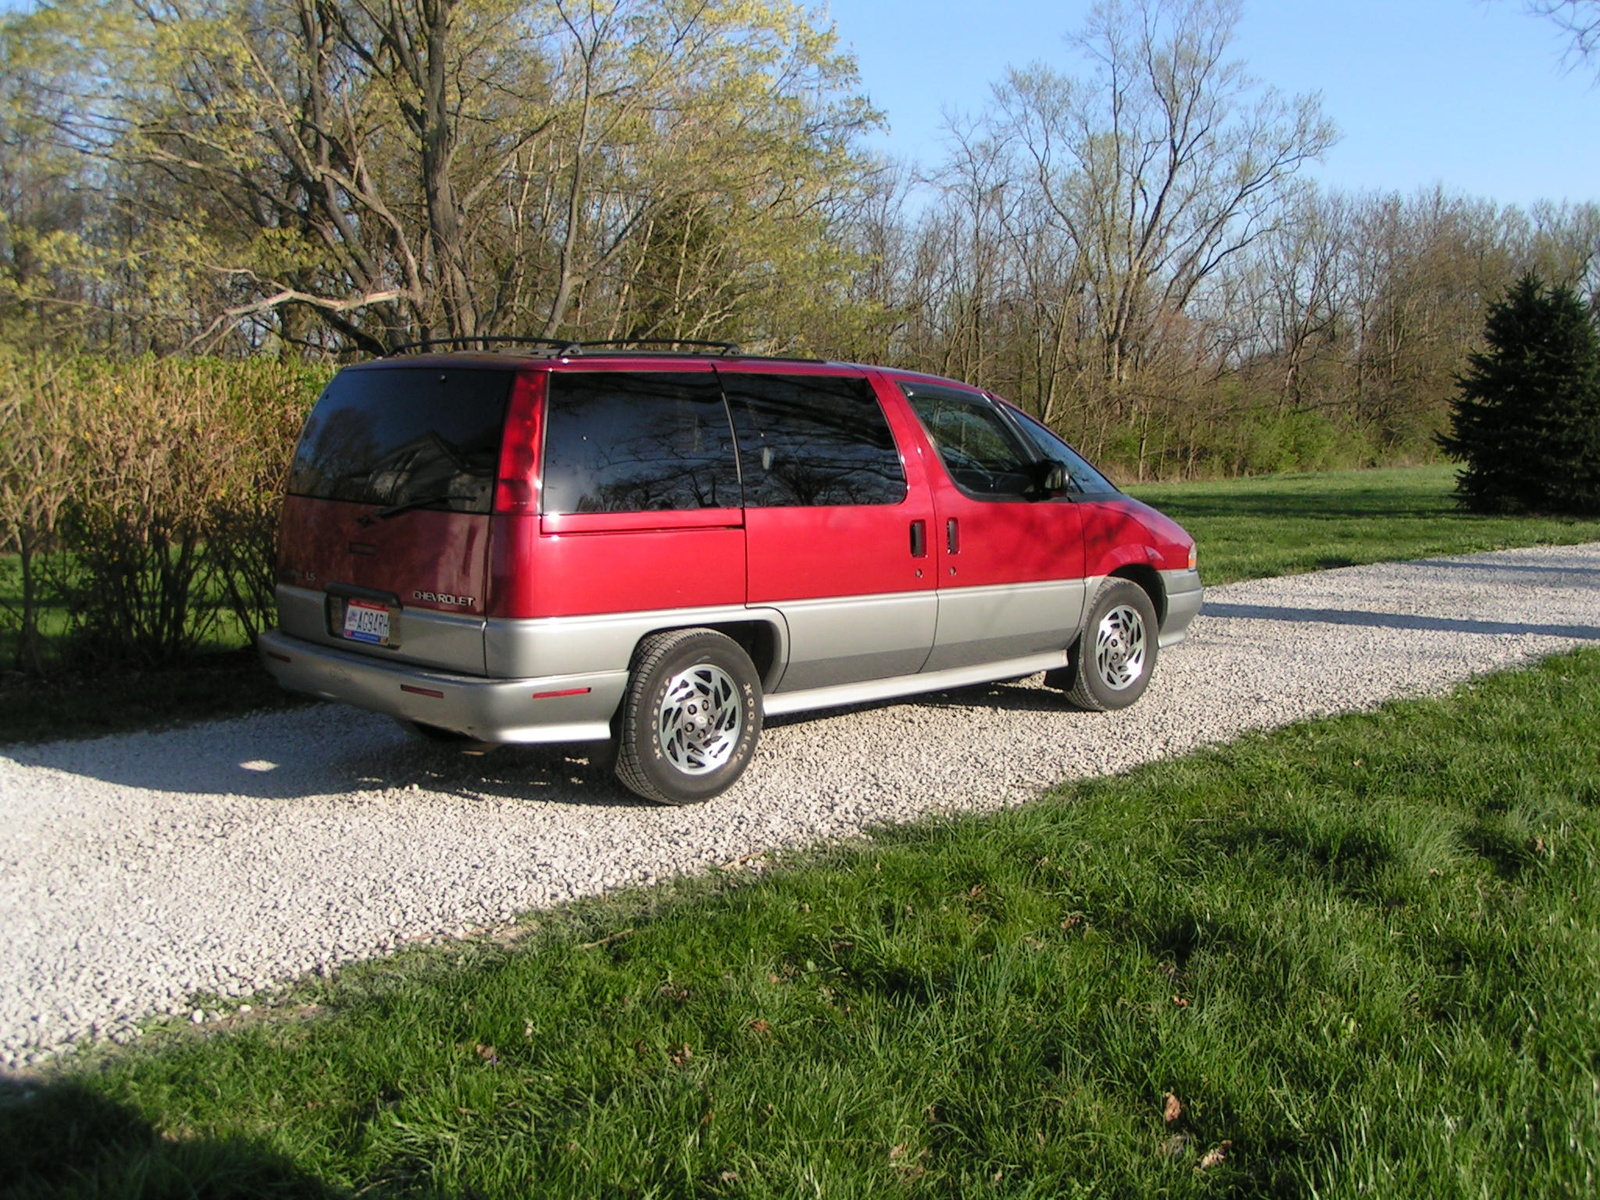 1995 chevrolet lumina minivan 3 chevrolet lumina minivan 3